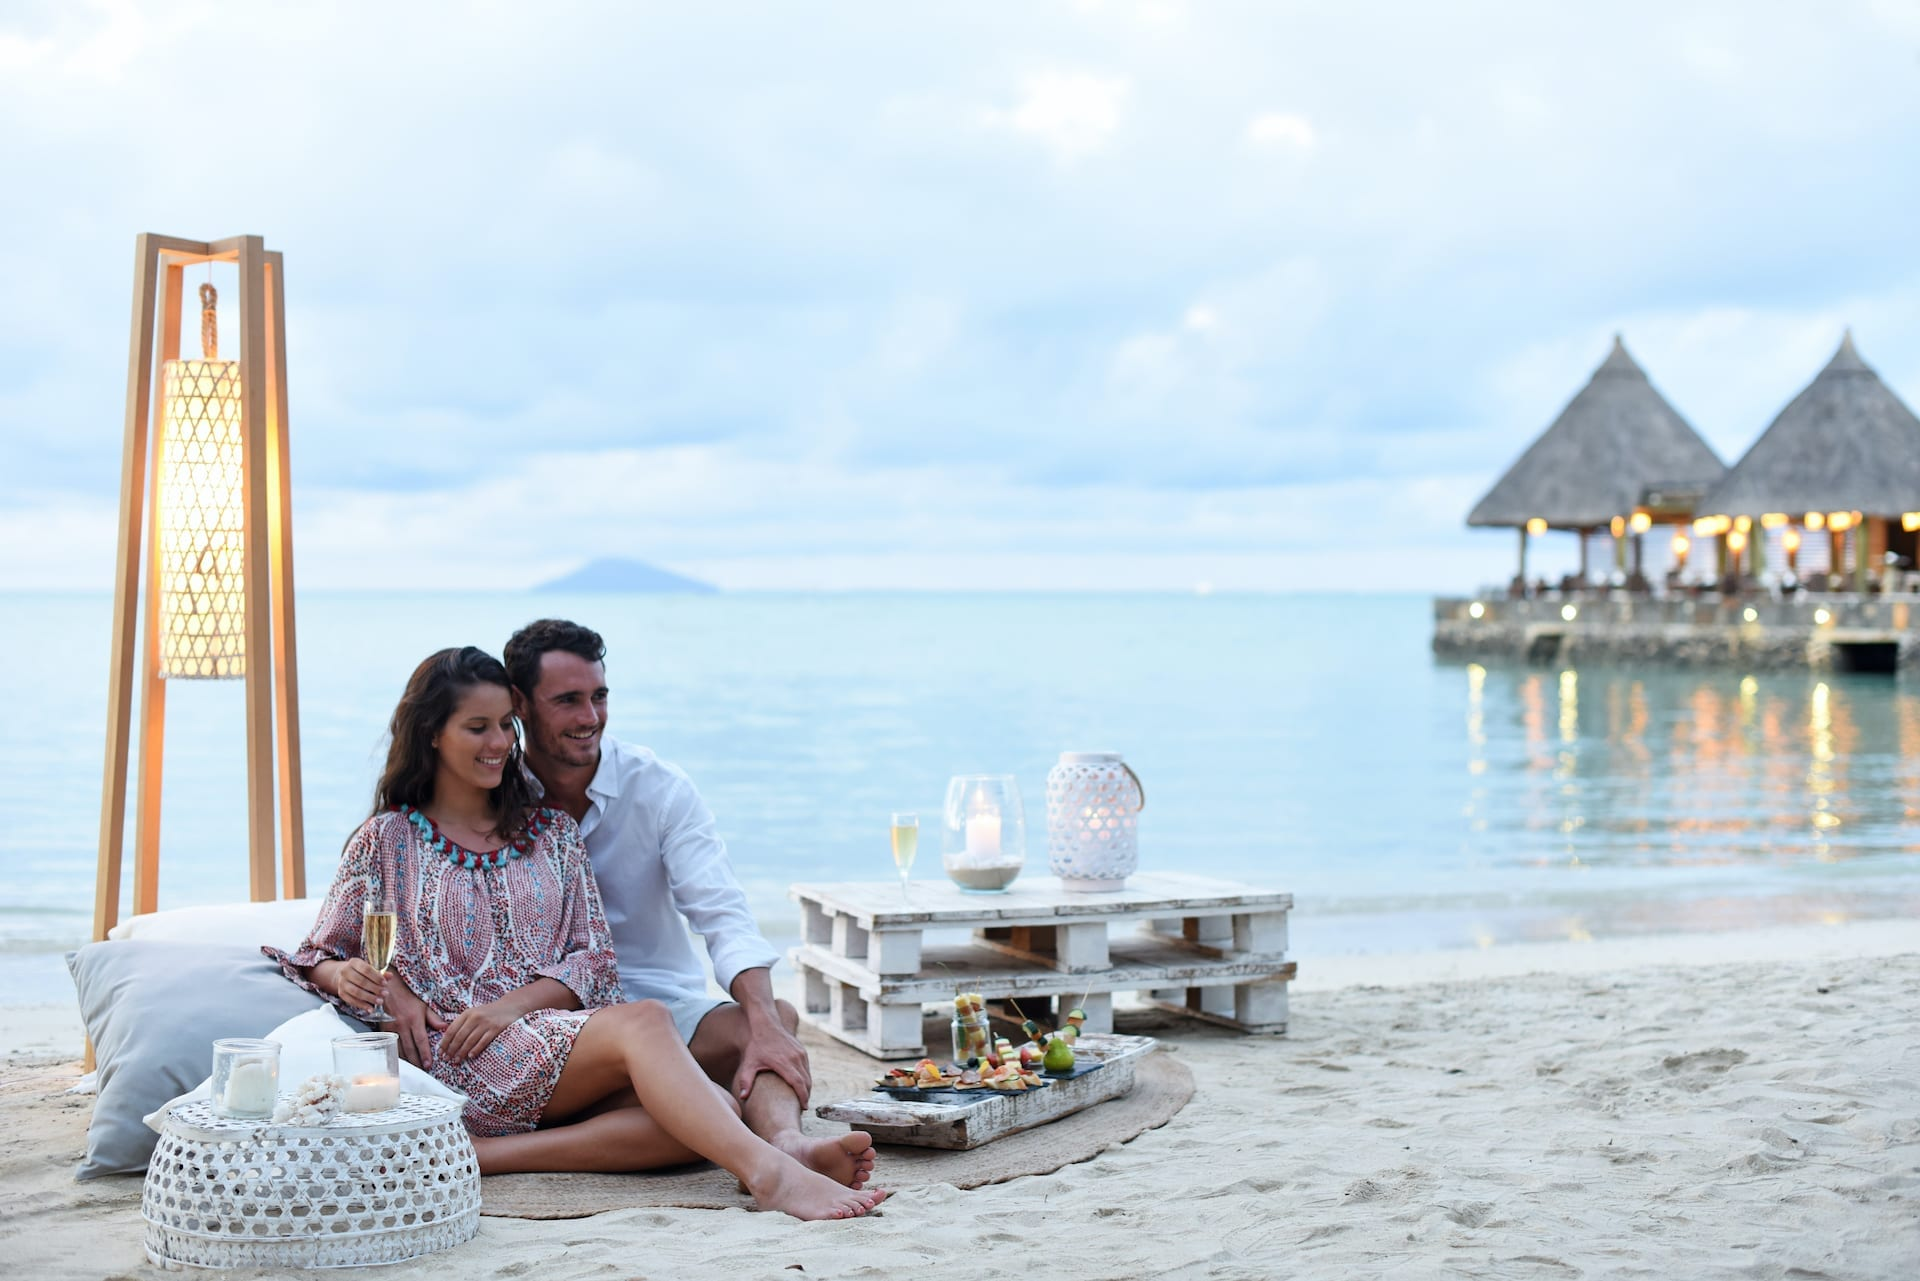 # FOTO - VPV-Apero-Moment-On-The-Beach kopie